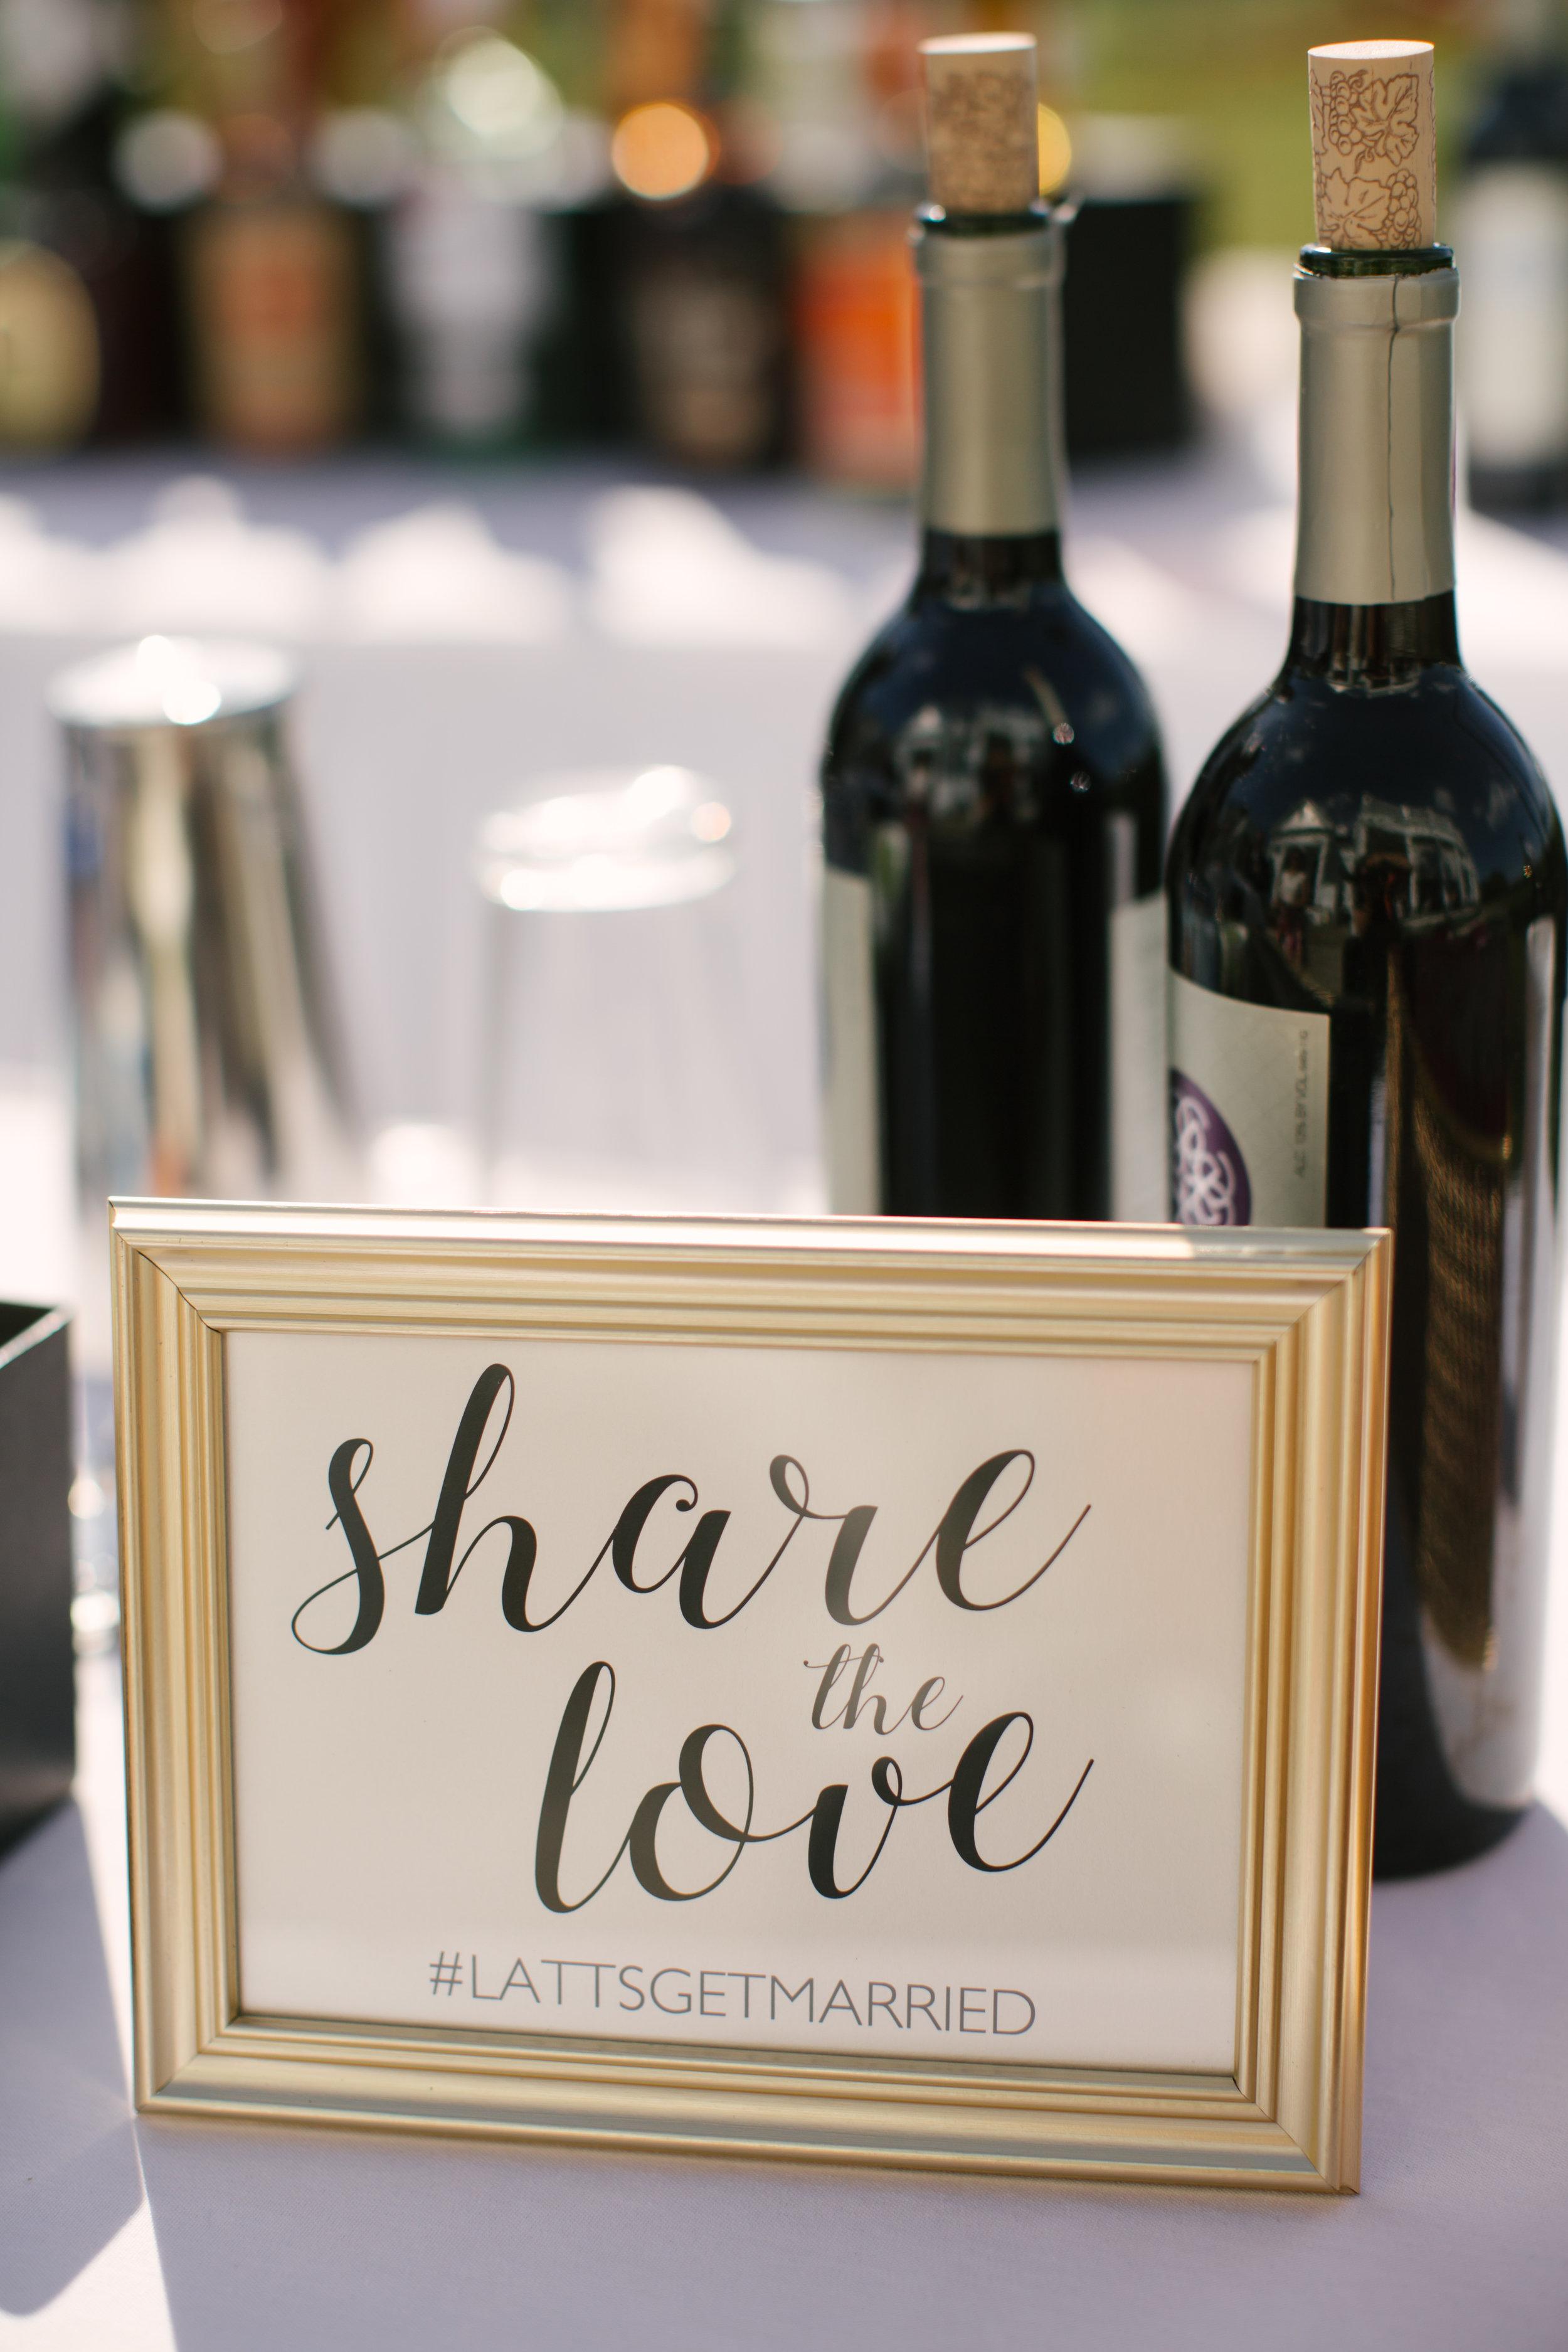 The couple's custom wedding hashtag in a gold framed sign on the bar.